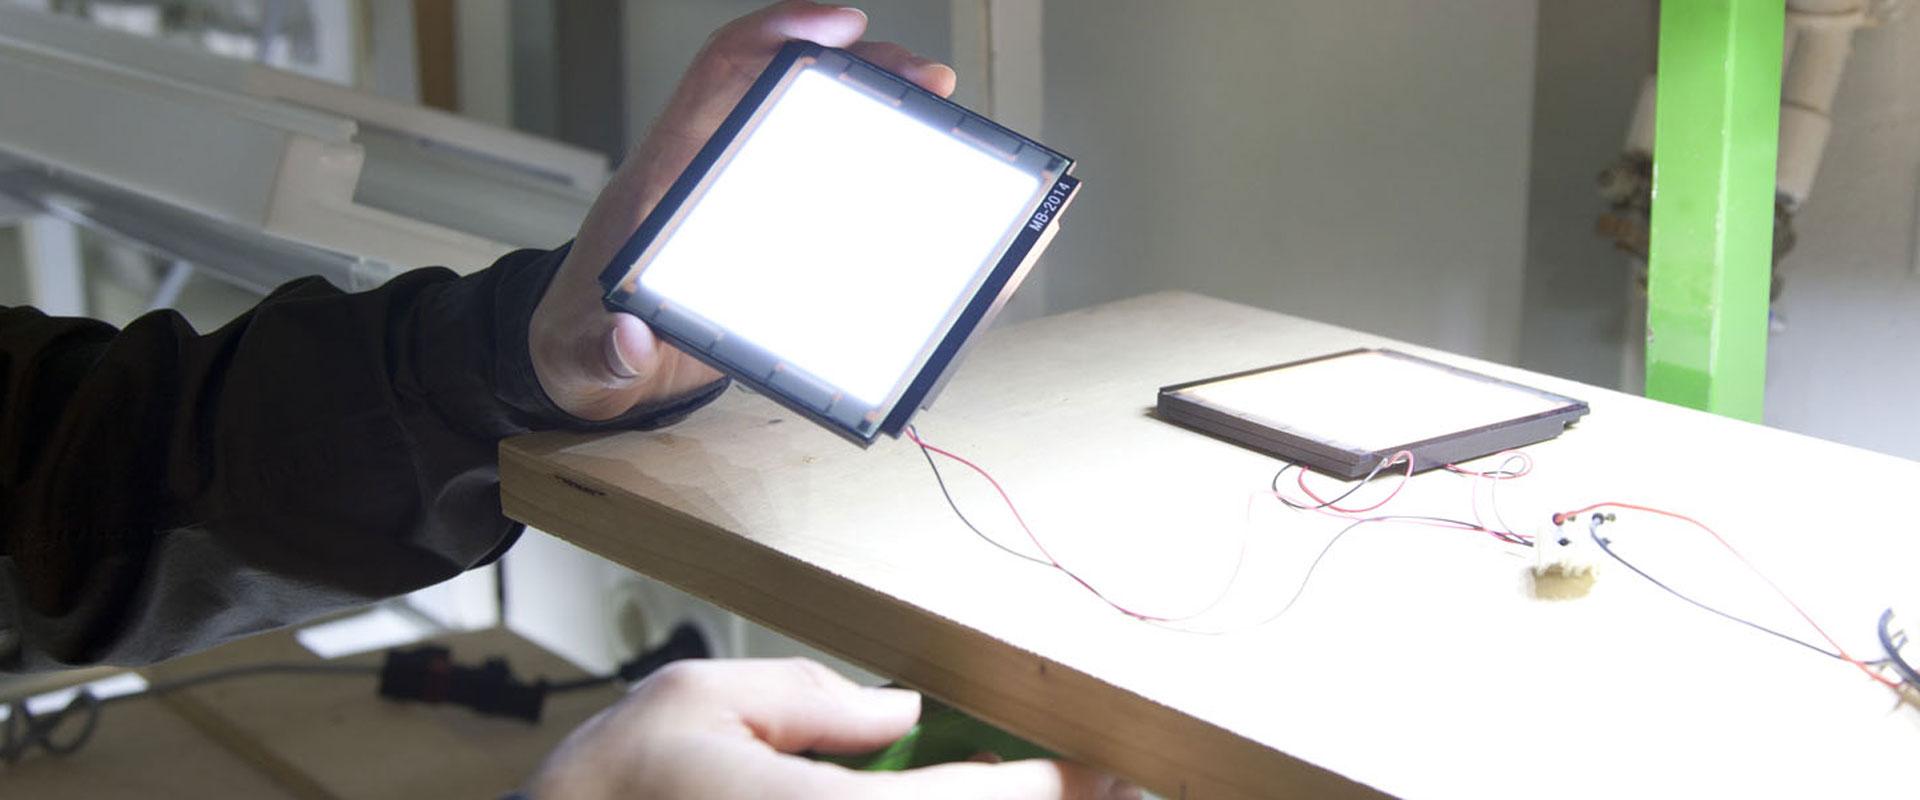 beleuchtung mit oled trilux simplify your light. Black Bedroom Furniture Sets. Home Design Ideas